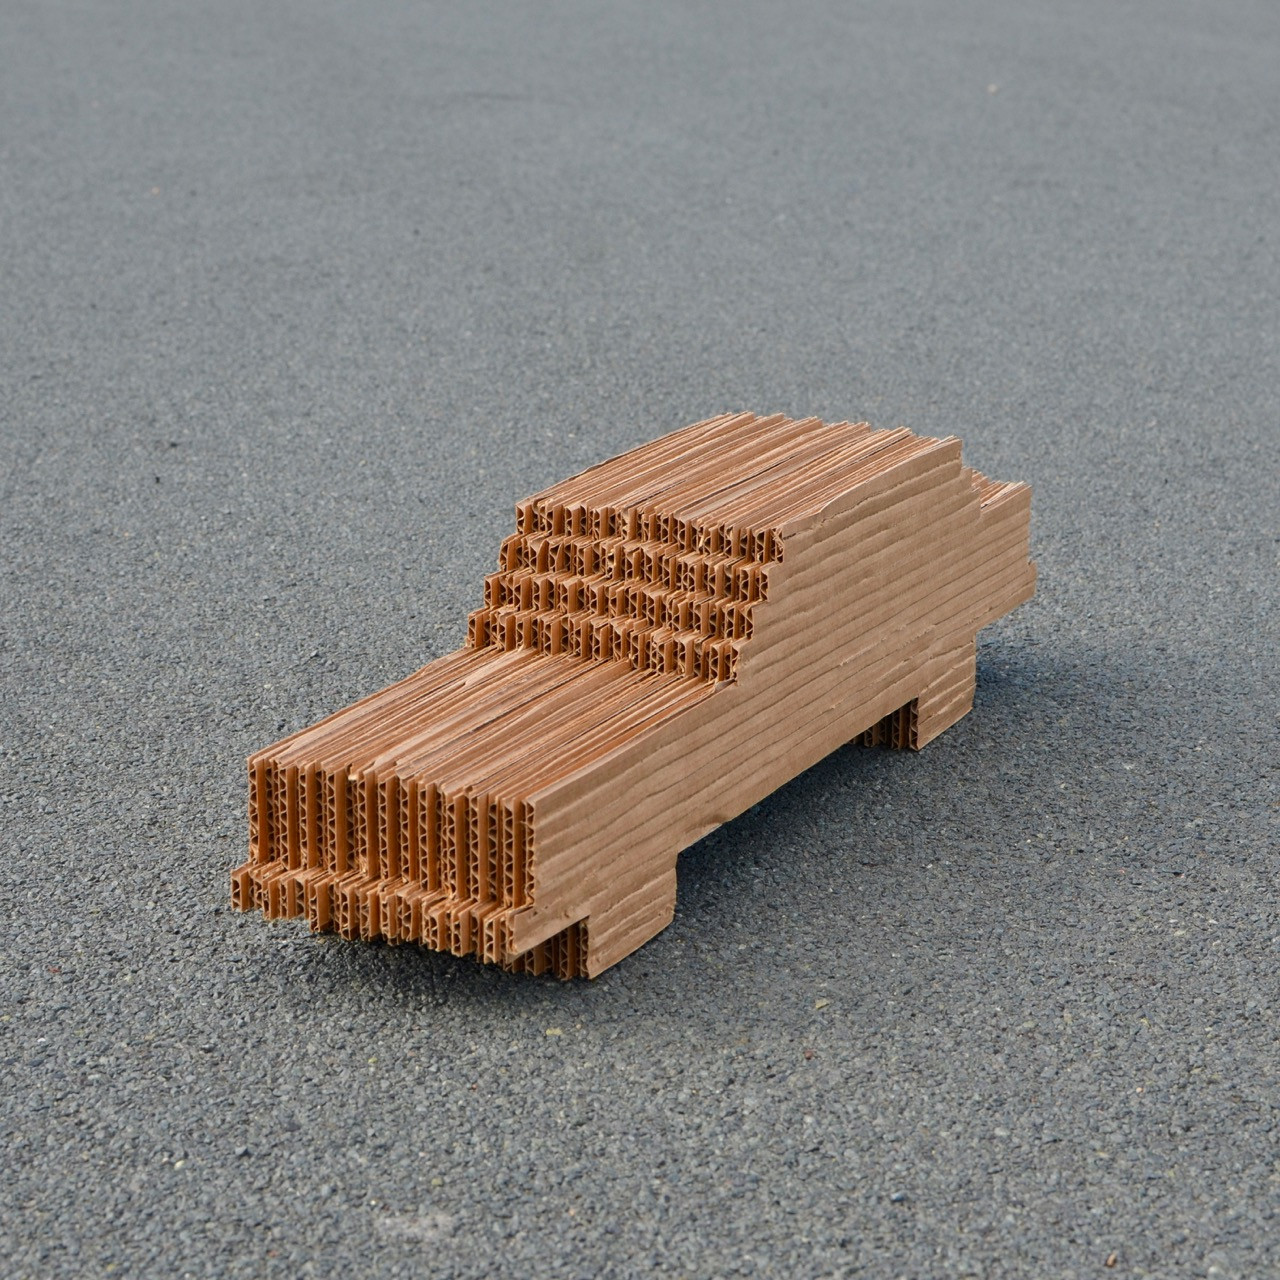 "The Car 2019. Cardboard, 5 1/4"" x 19 1/2"" x 4 1/2"""